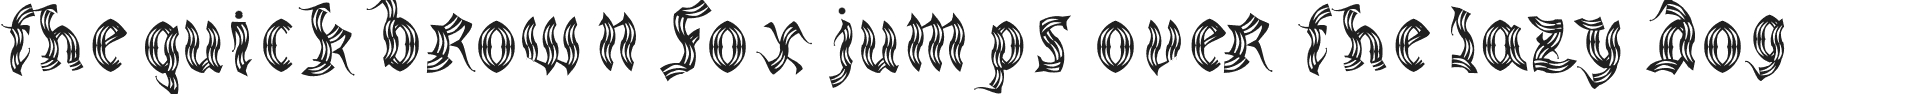 medieval font free